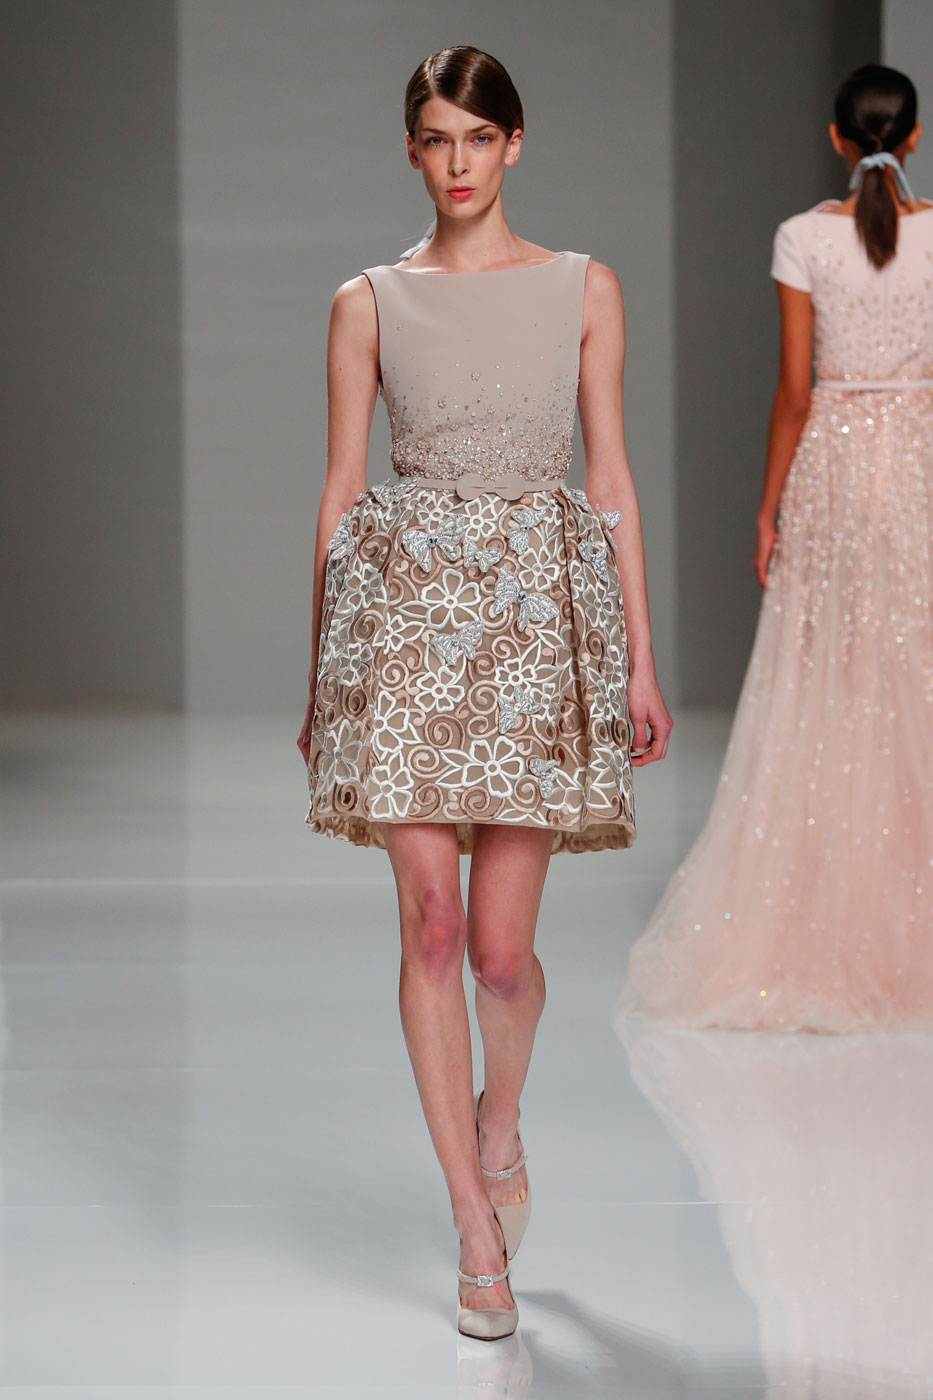 Georges-Hobeika-fashion-runway-show-haute-couture-paris-spring-2015-the-impression-53